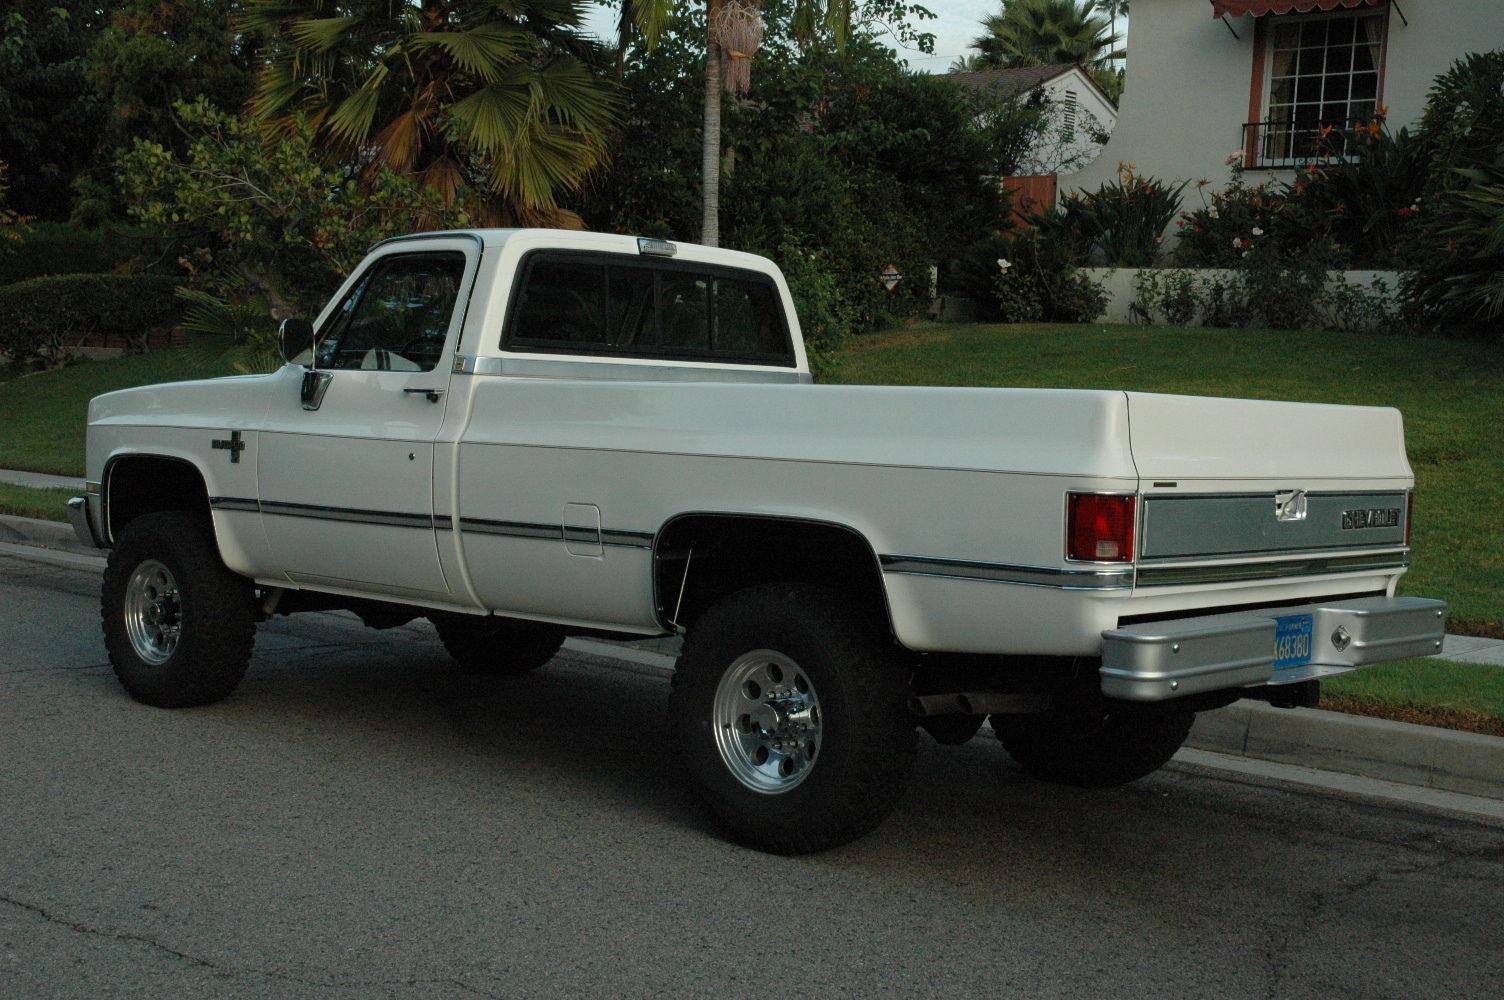 1976 Chevy Silverado 3 4 Ton Truck